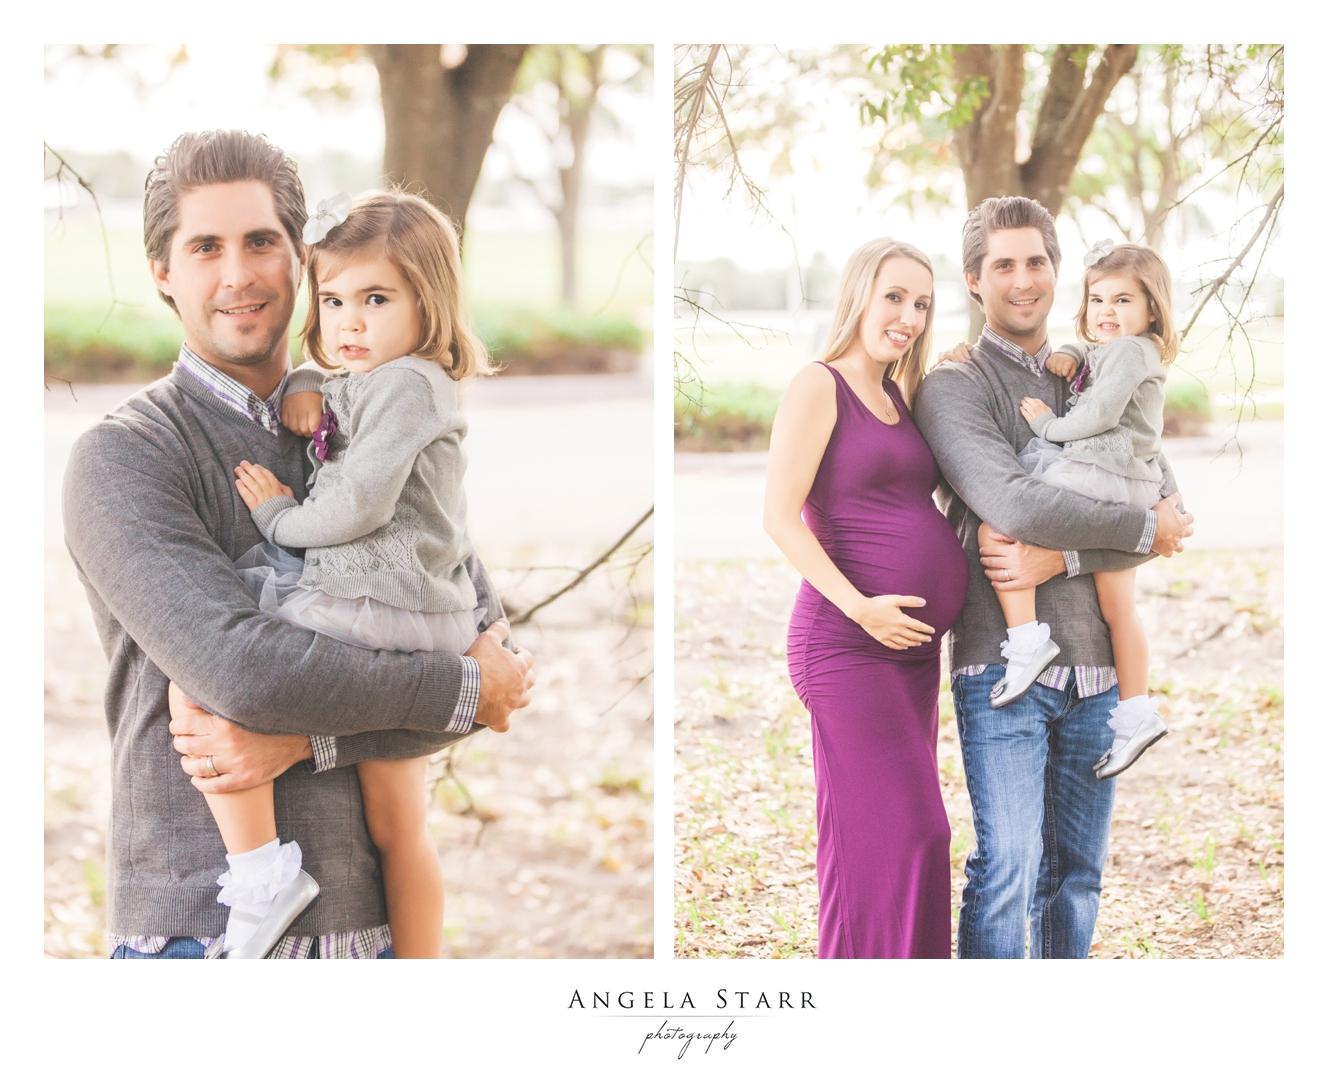 AngelaStarrPhotography_0016.jpg